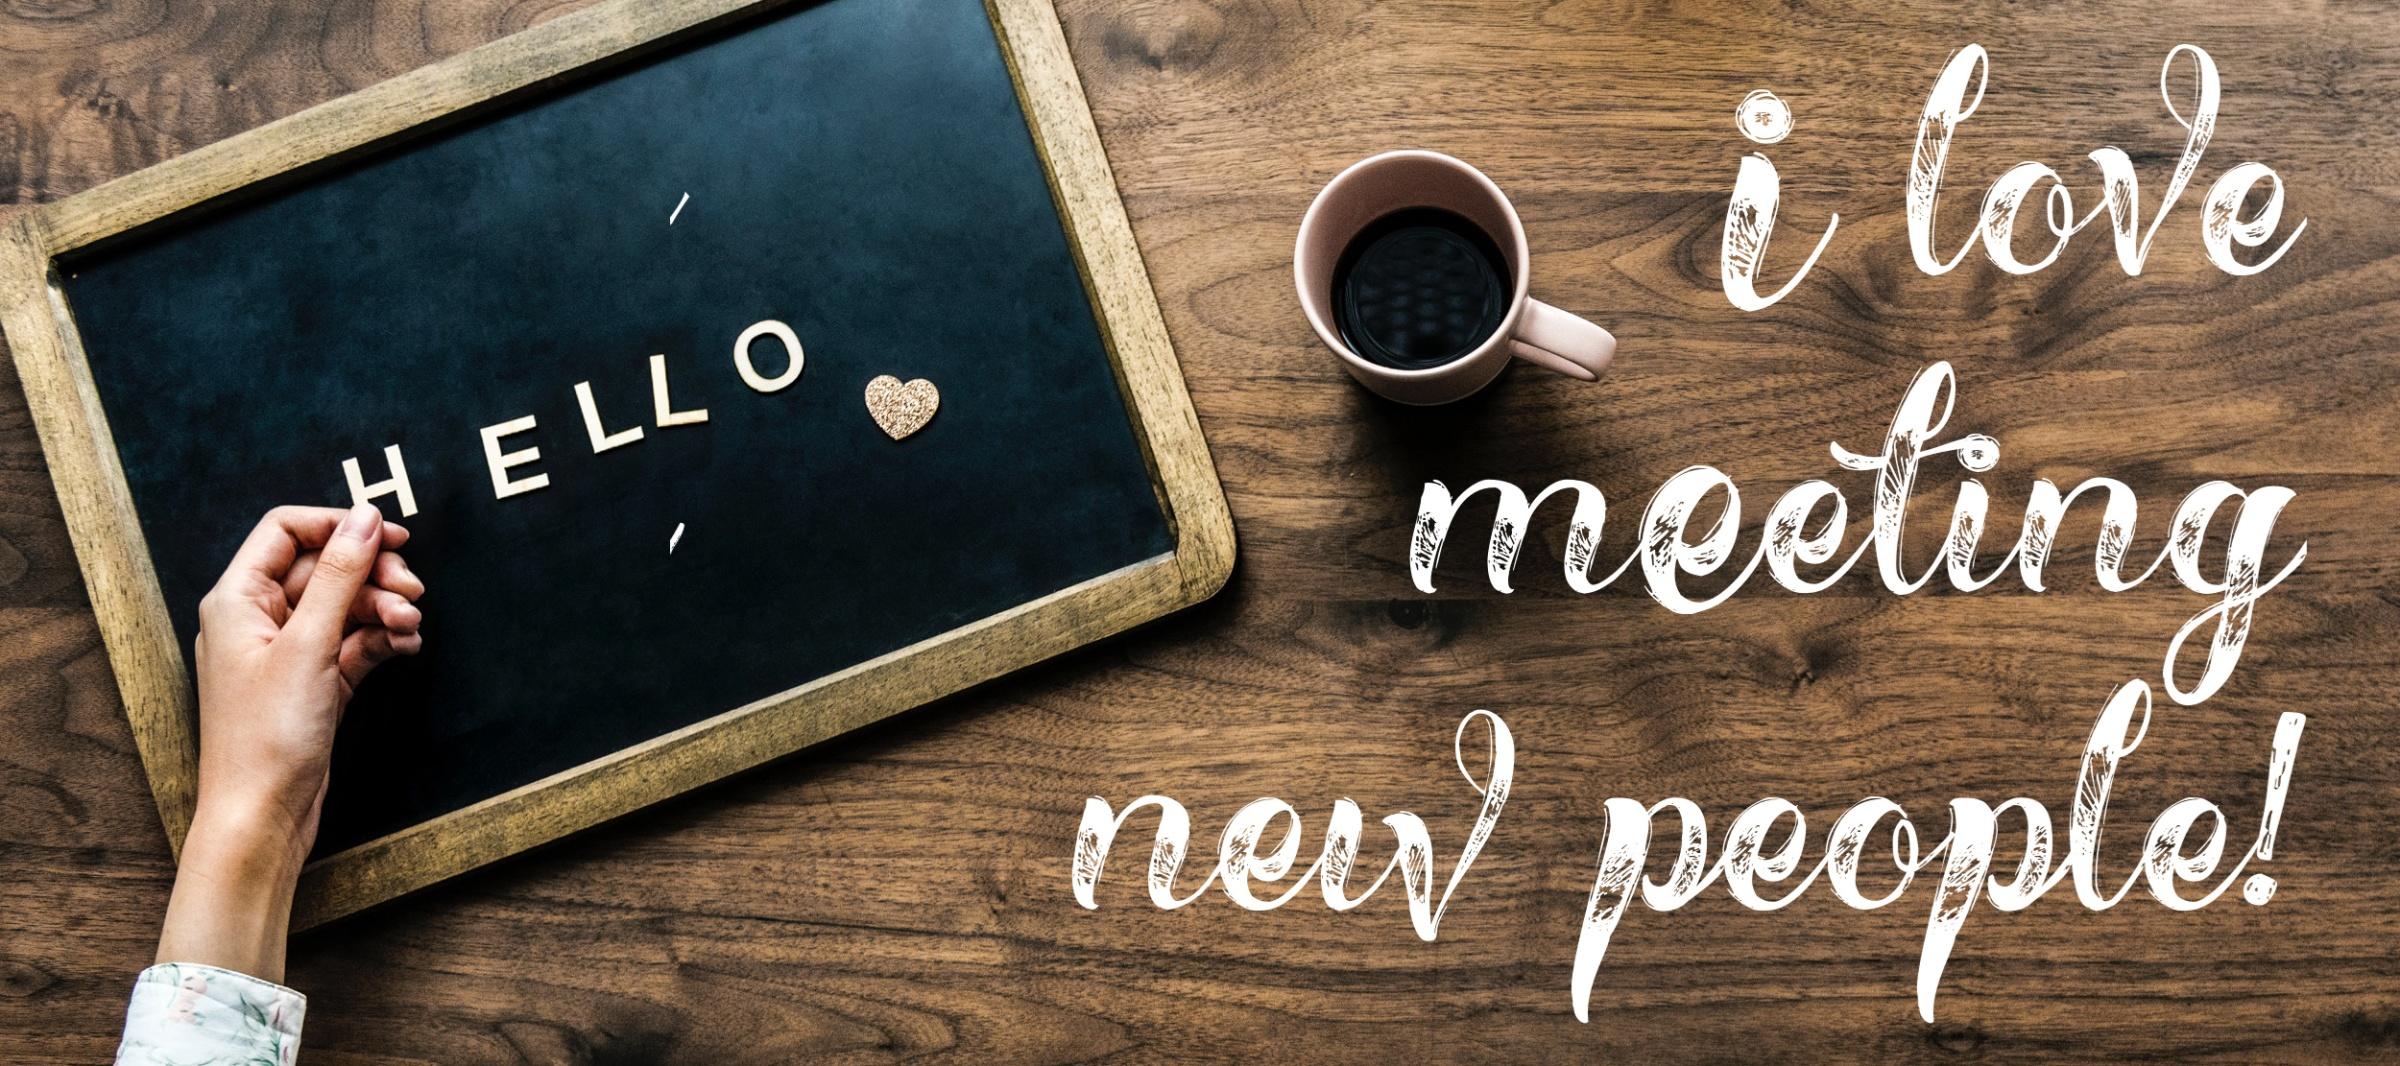 Hello! I love meeting new people! Contact Jenni Burks here.